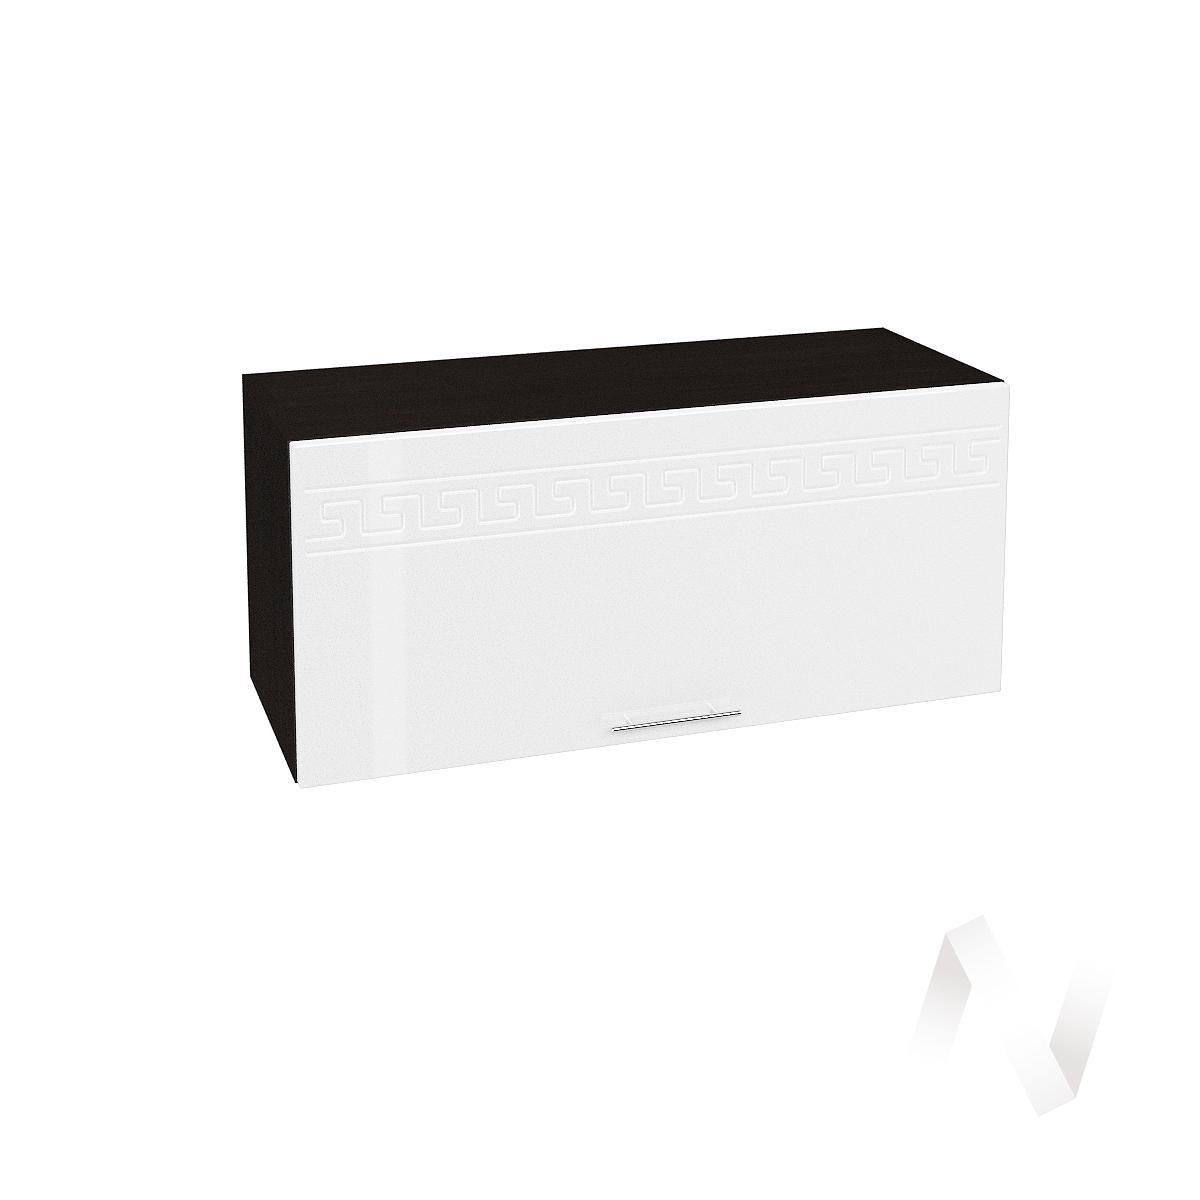 "Кухня ""Греция"": Шкаф верхний горизонтальный 800, ШВГ 800 (белый металлик/корпус венге)"